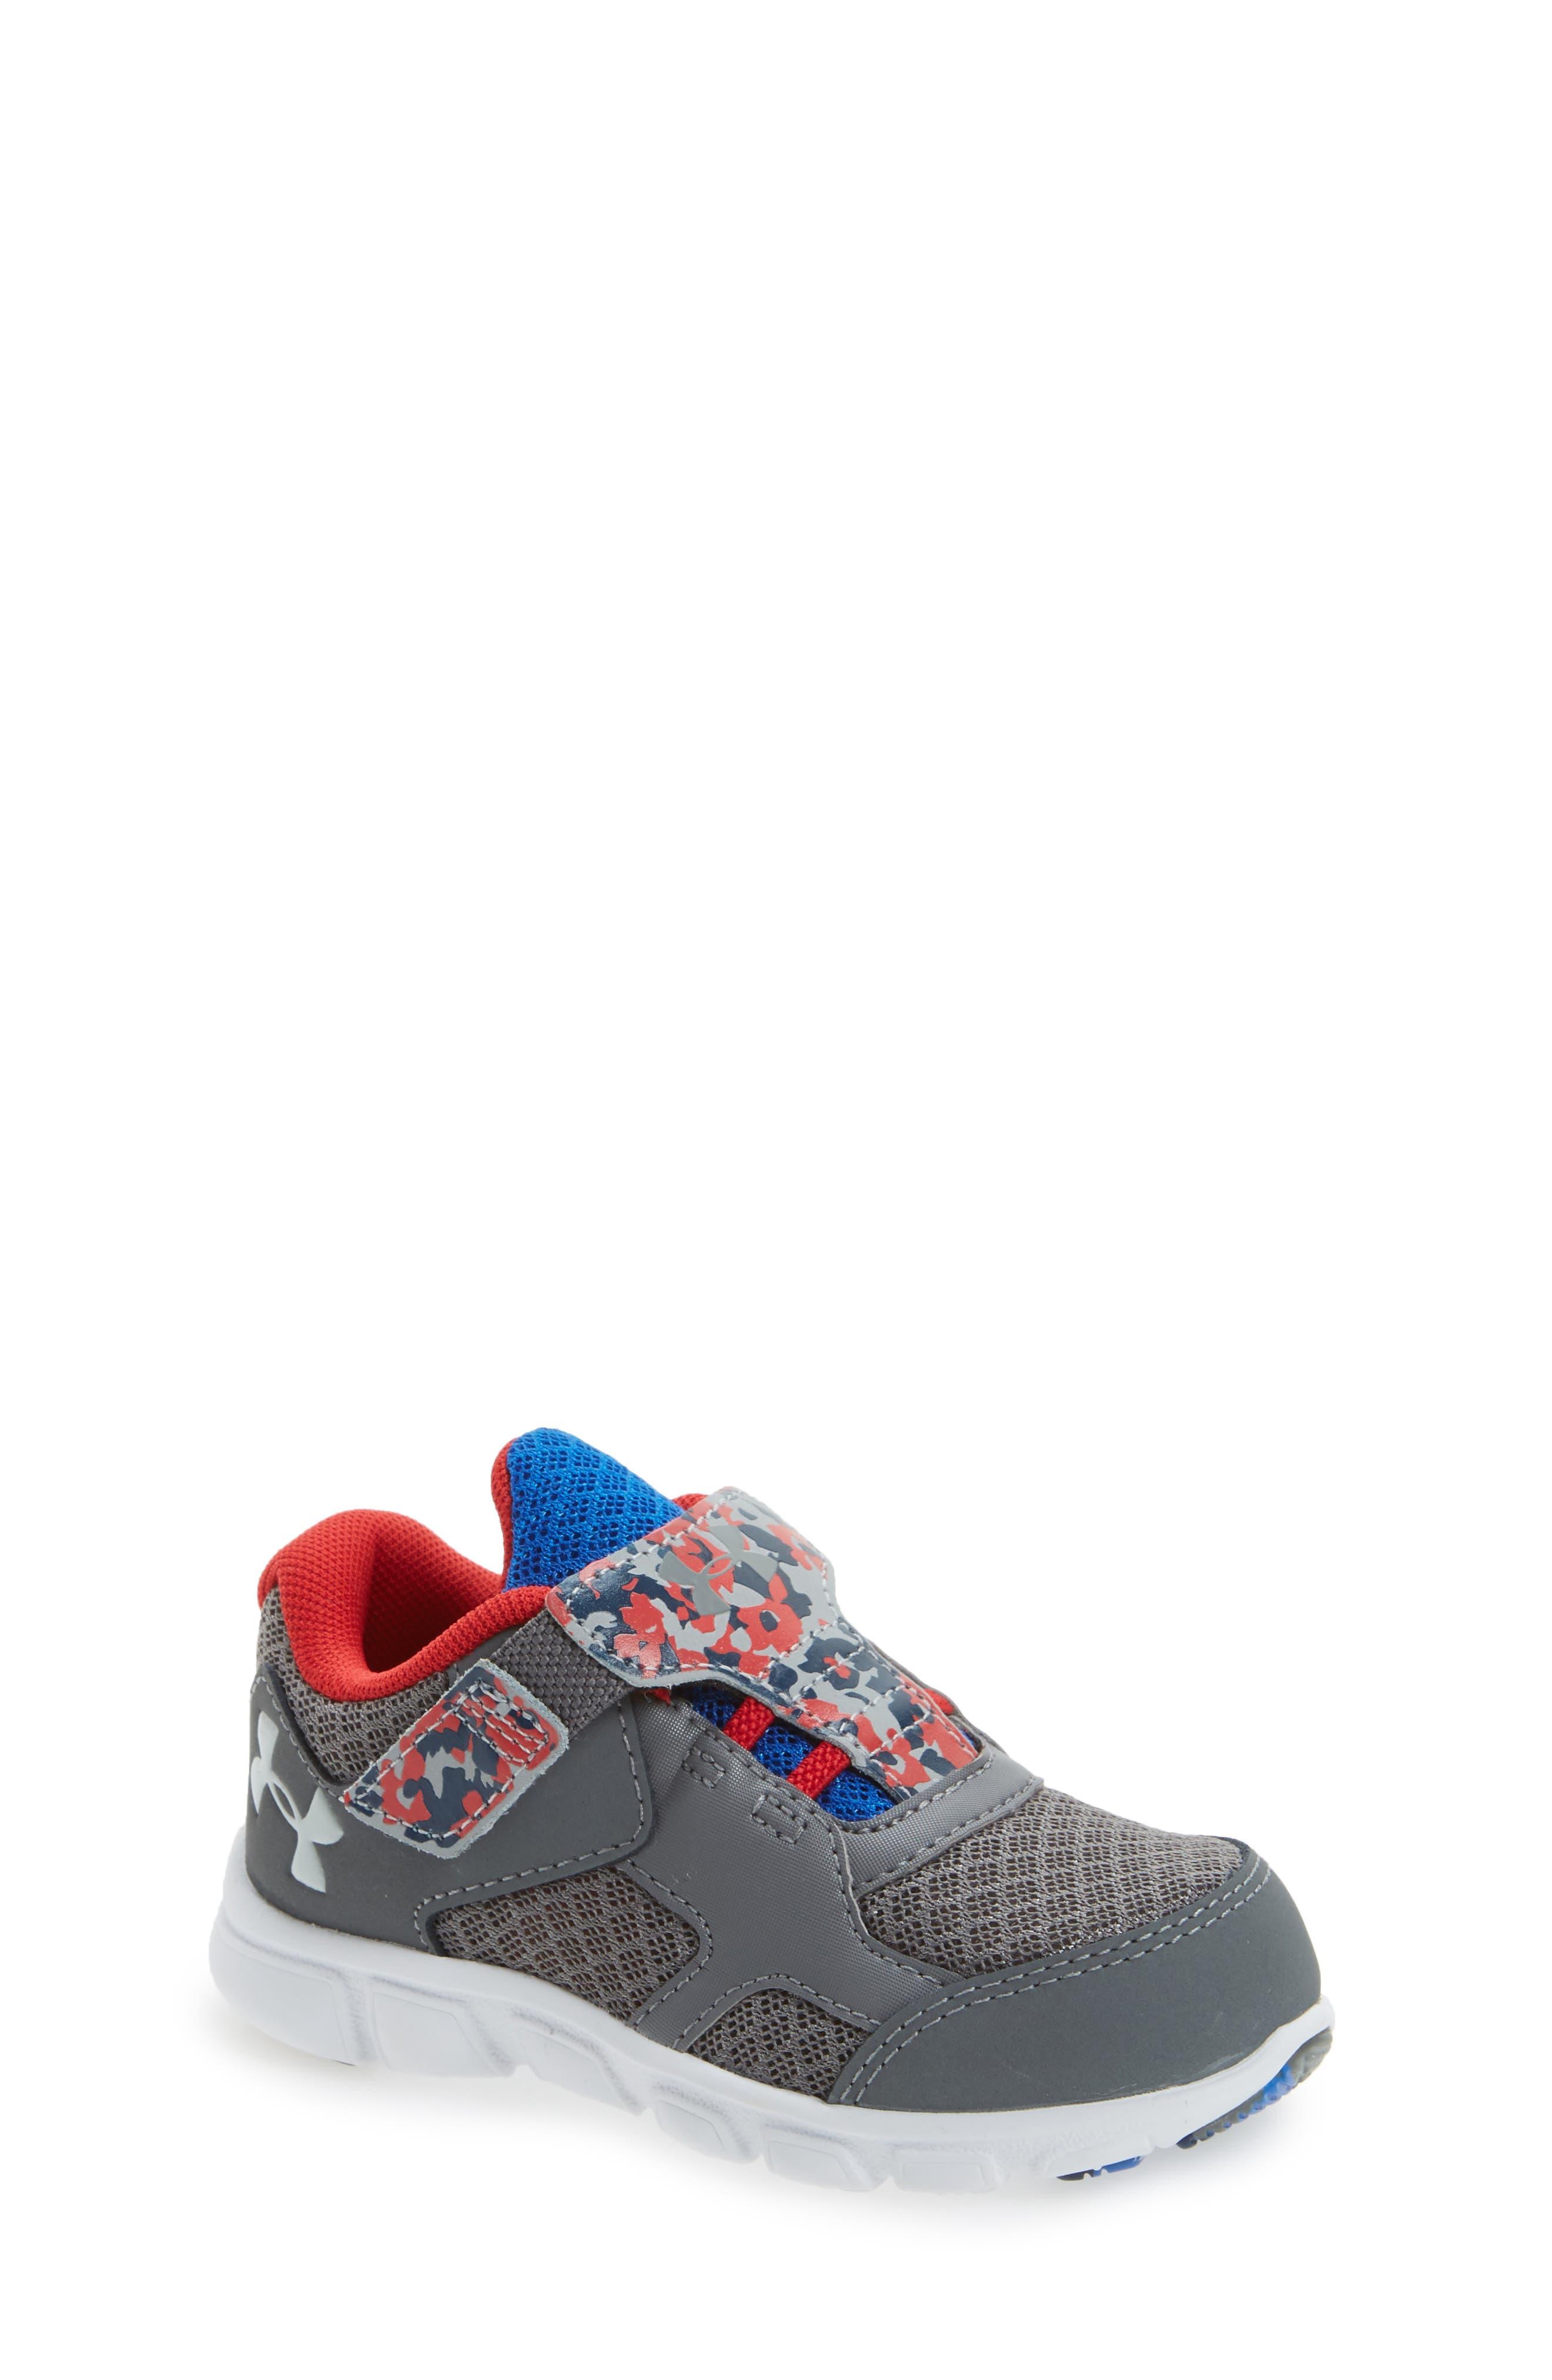 UNDER ARMOUR Engage II Athletic Shoe